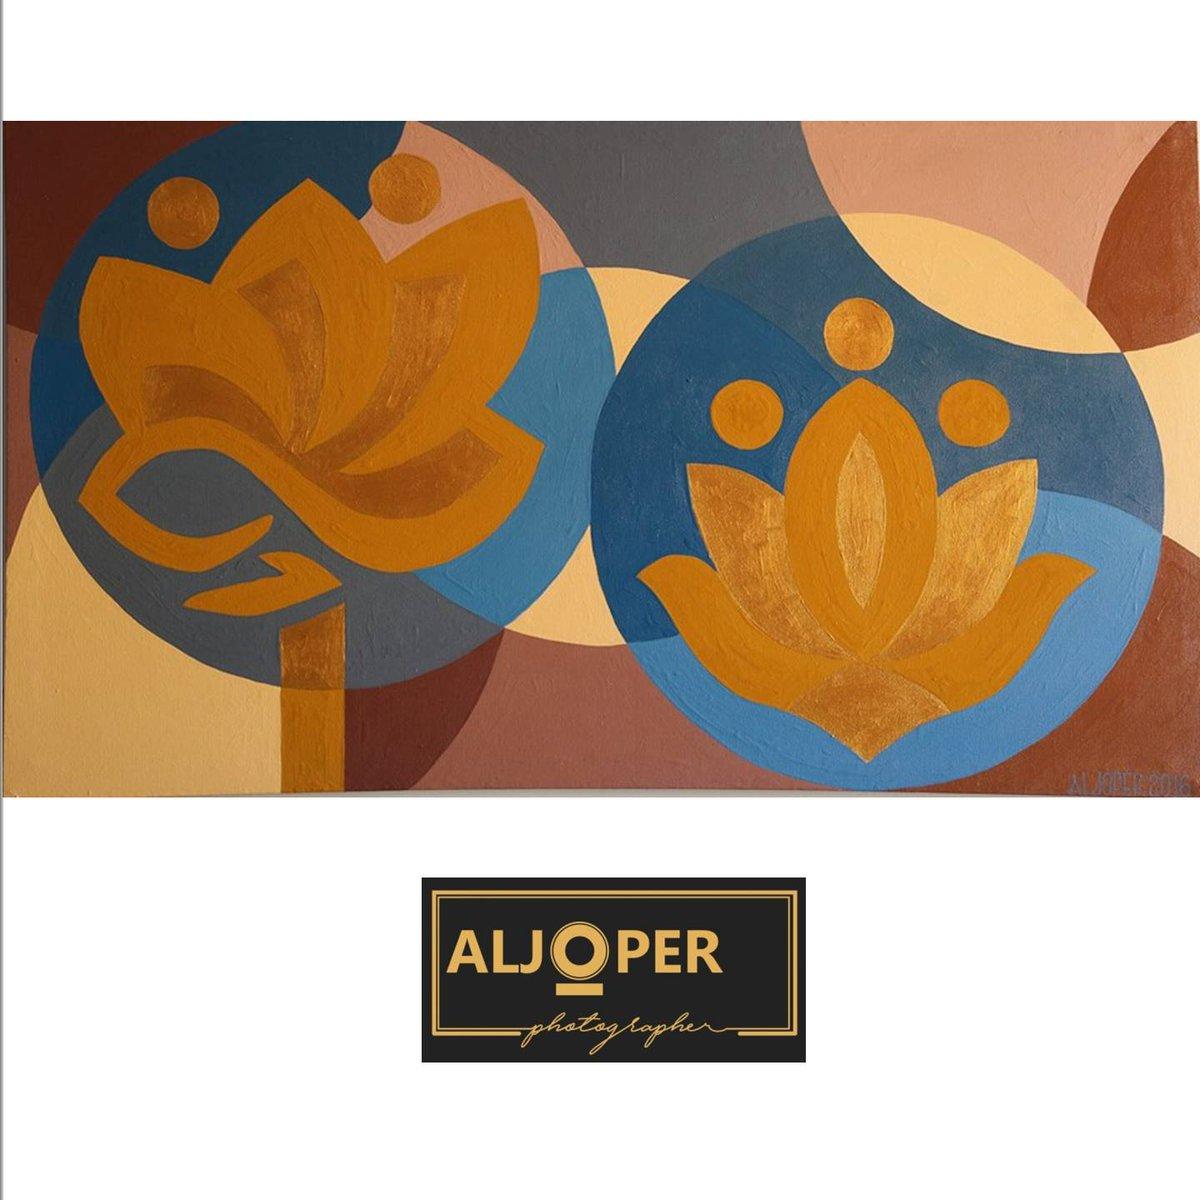 Obra de arte. Técnica: Acrílico sobre lienzo. @Aljoper #UnAlJoper #Aljoper #Aljoper2020 #ObraDeArte #ArteVenezolano #RegalaArte #CompraArte pic.twitter.com/ag09ruQ9J7